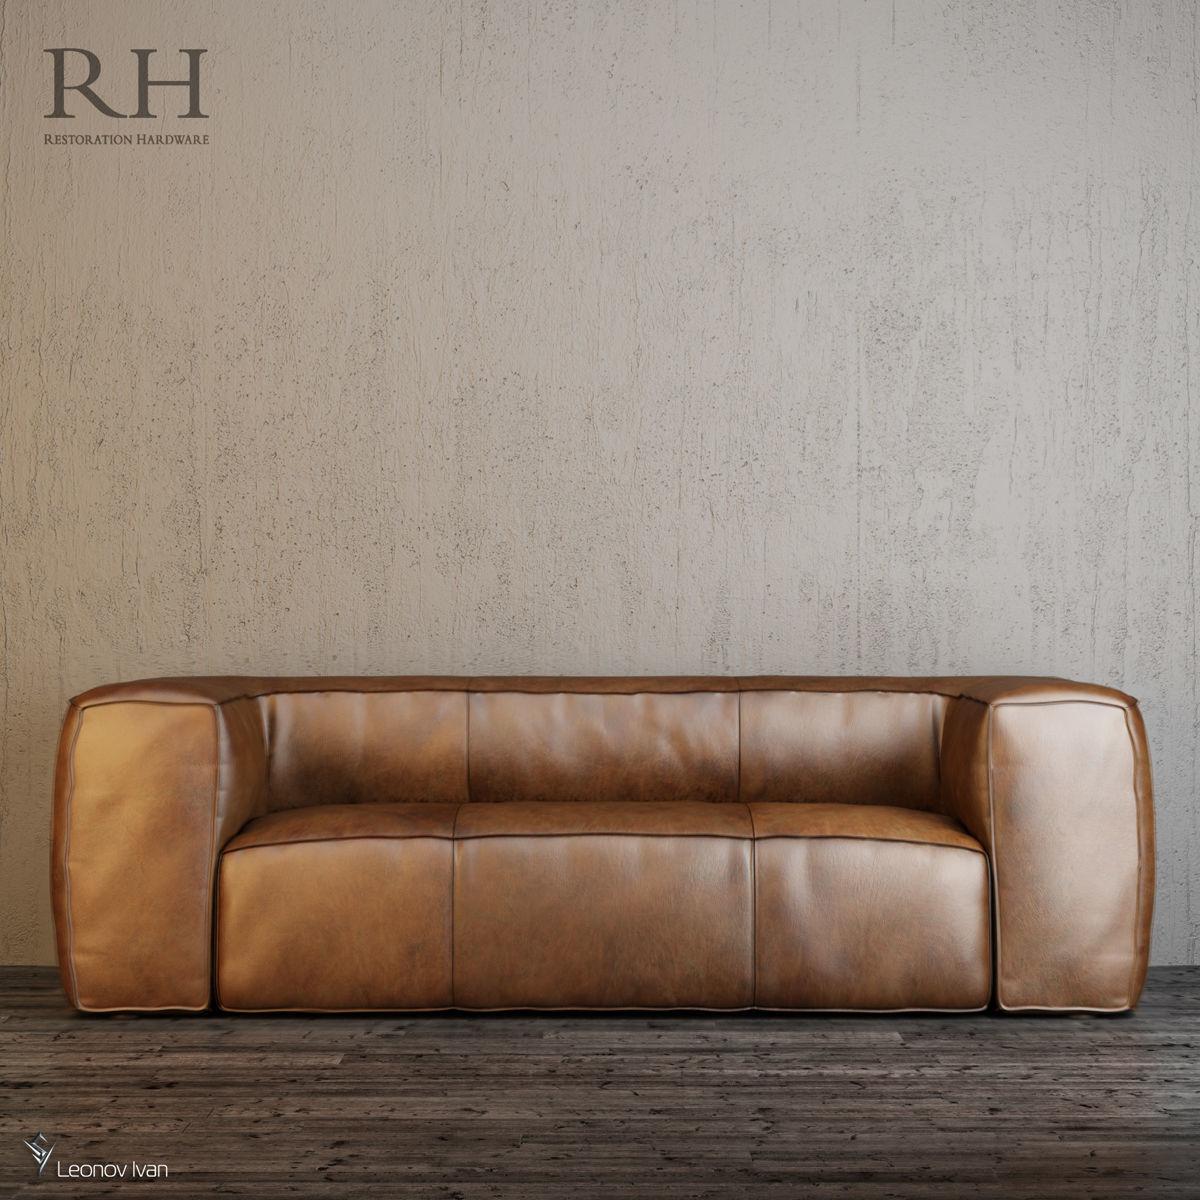 Fulham Leather Sofas 3d Model Max Obj Mtl 3ds Fbx 1 ...